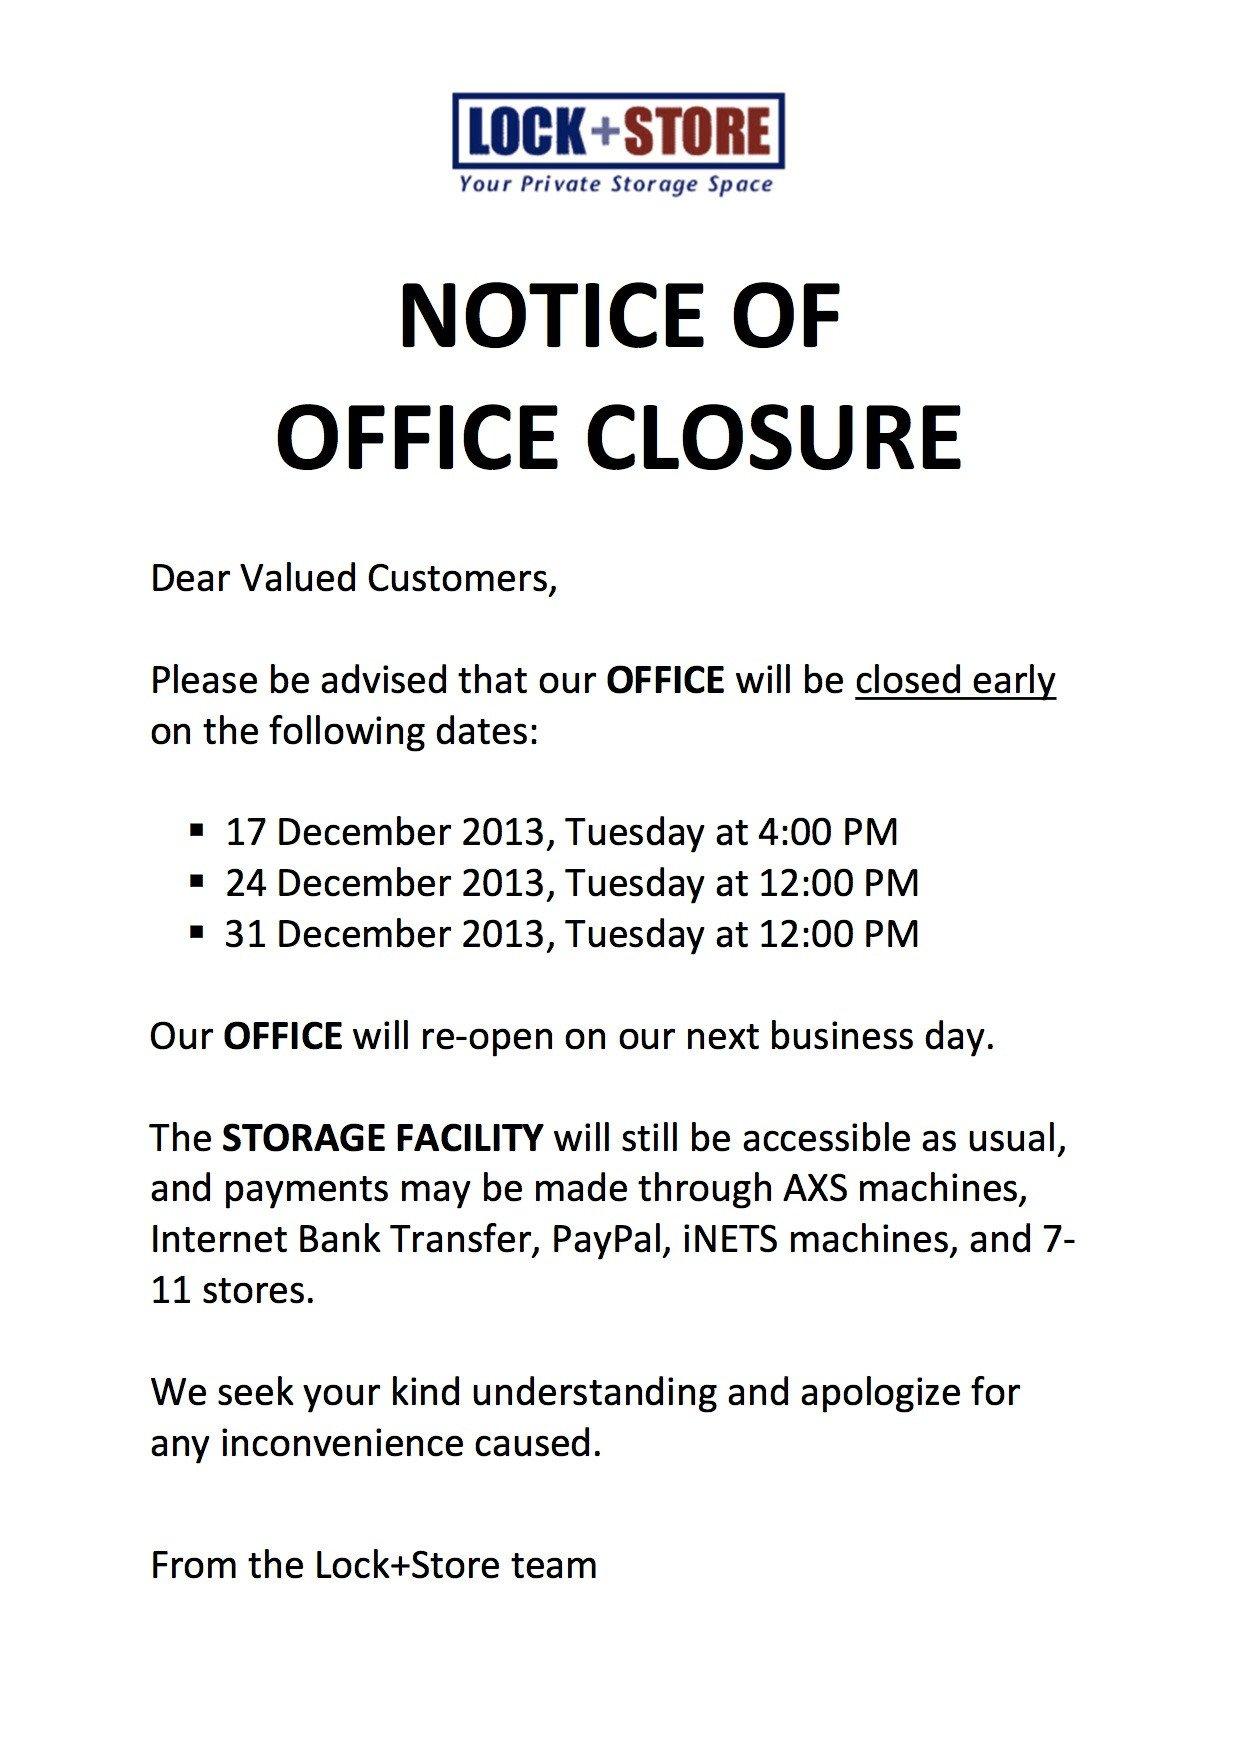 Holiday Closing Notice Template Lockandstore Lock Store